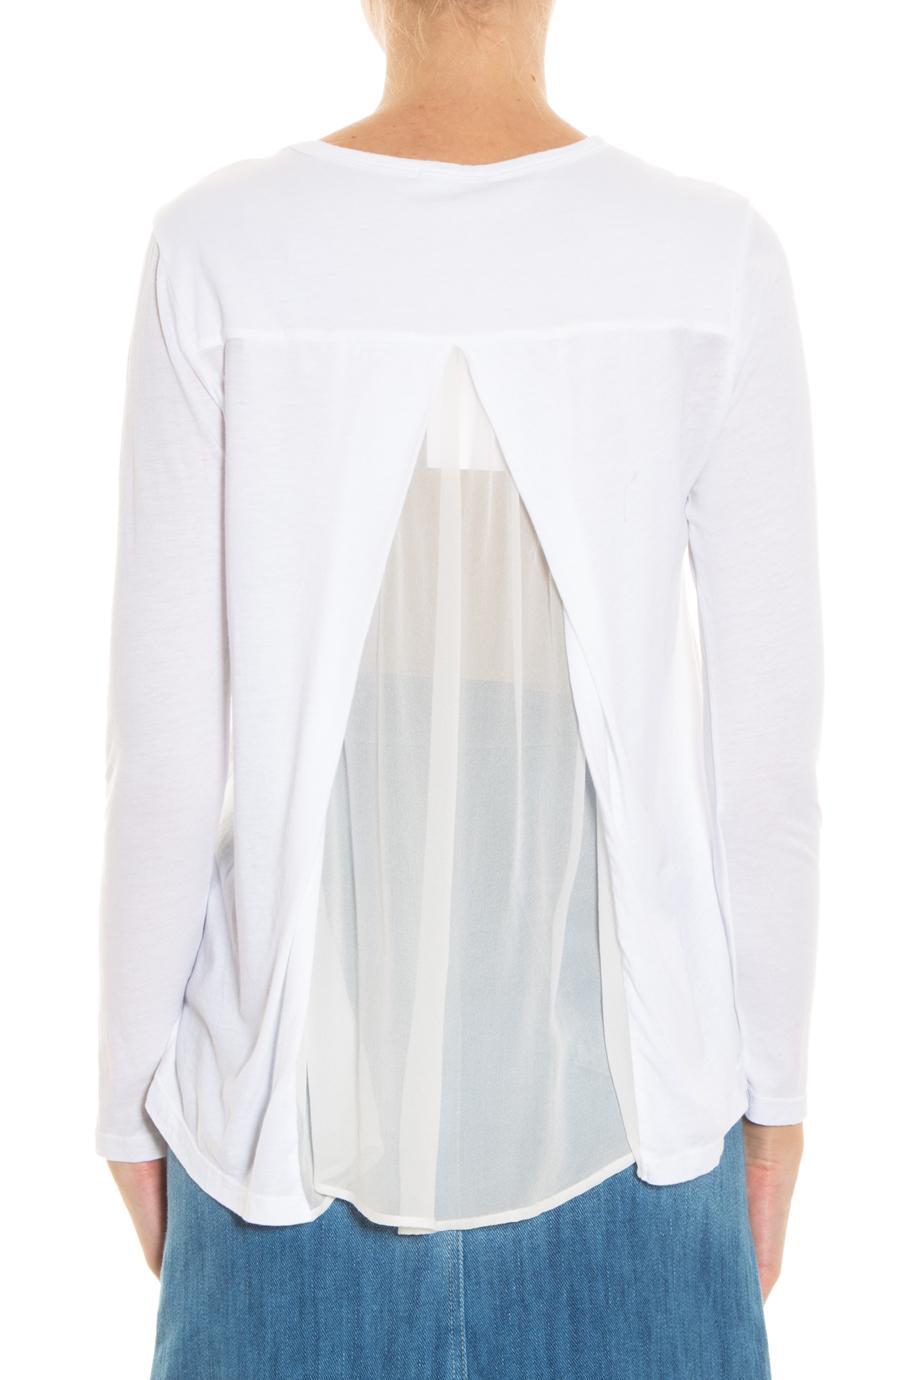 Clu silk back t shirt in white lyst for Silk white t shirt